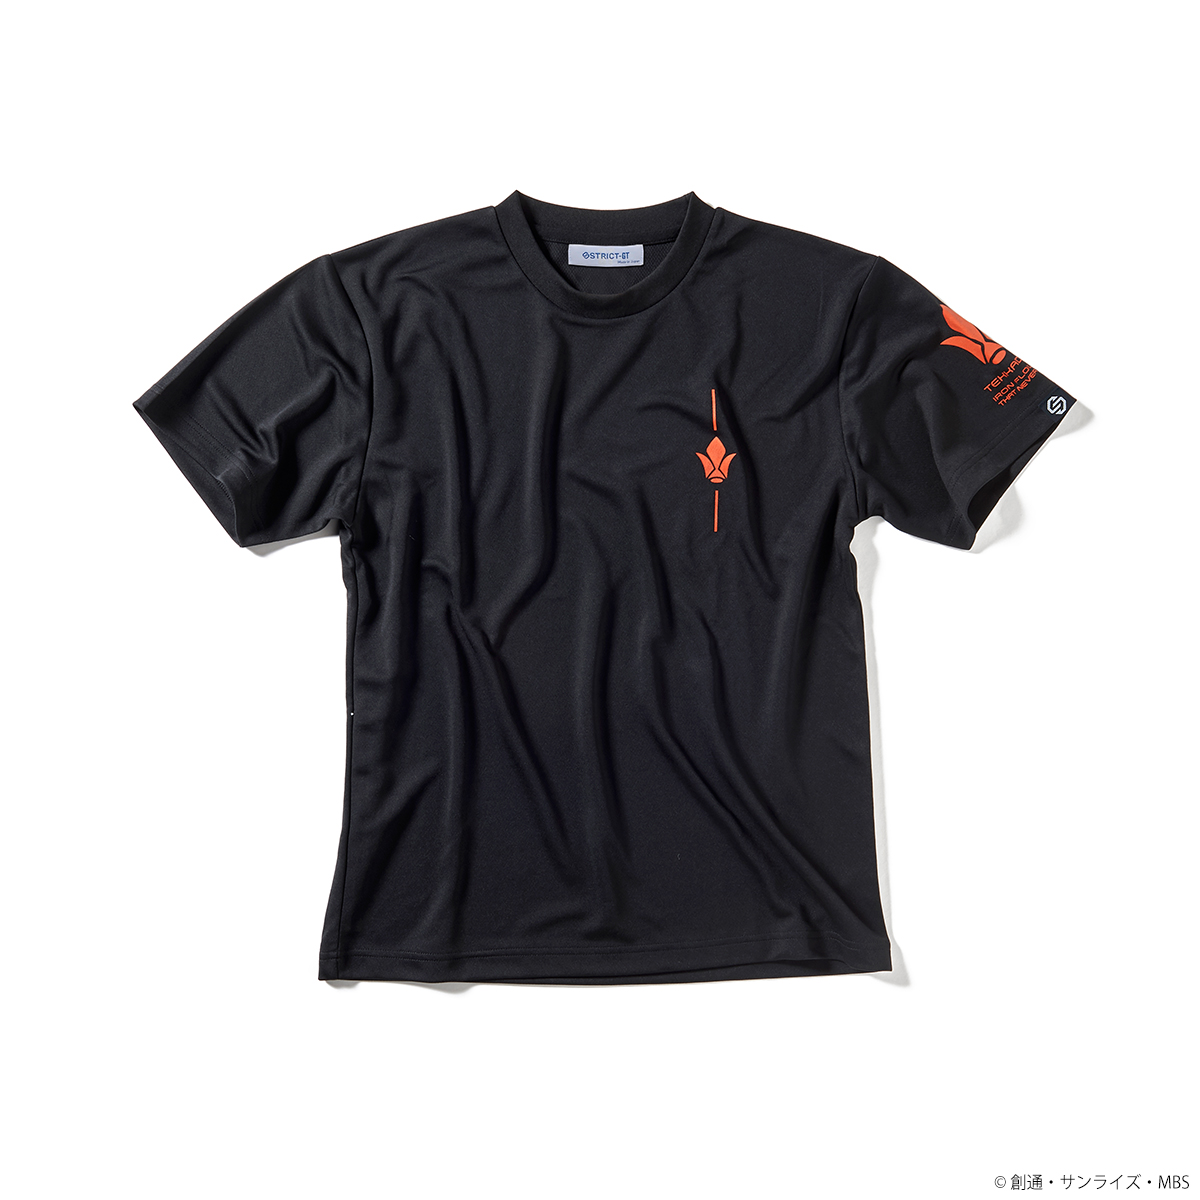 STRICT-G 『機動戦士ガンダム 鉄血のオルフェンズ』 ドライTシャツ 鉄華団